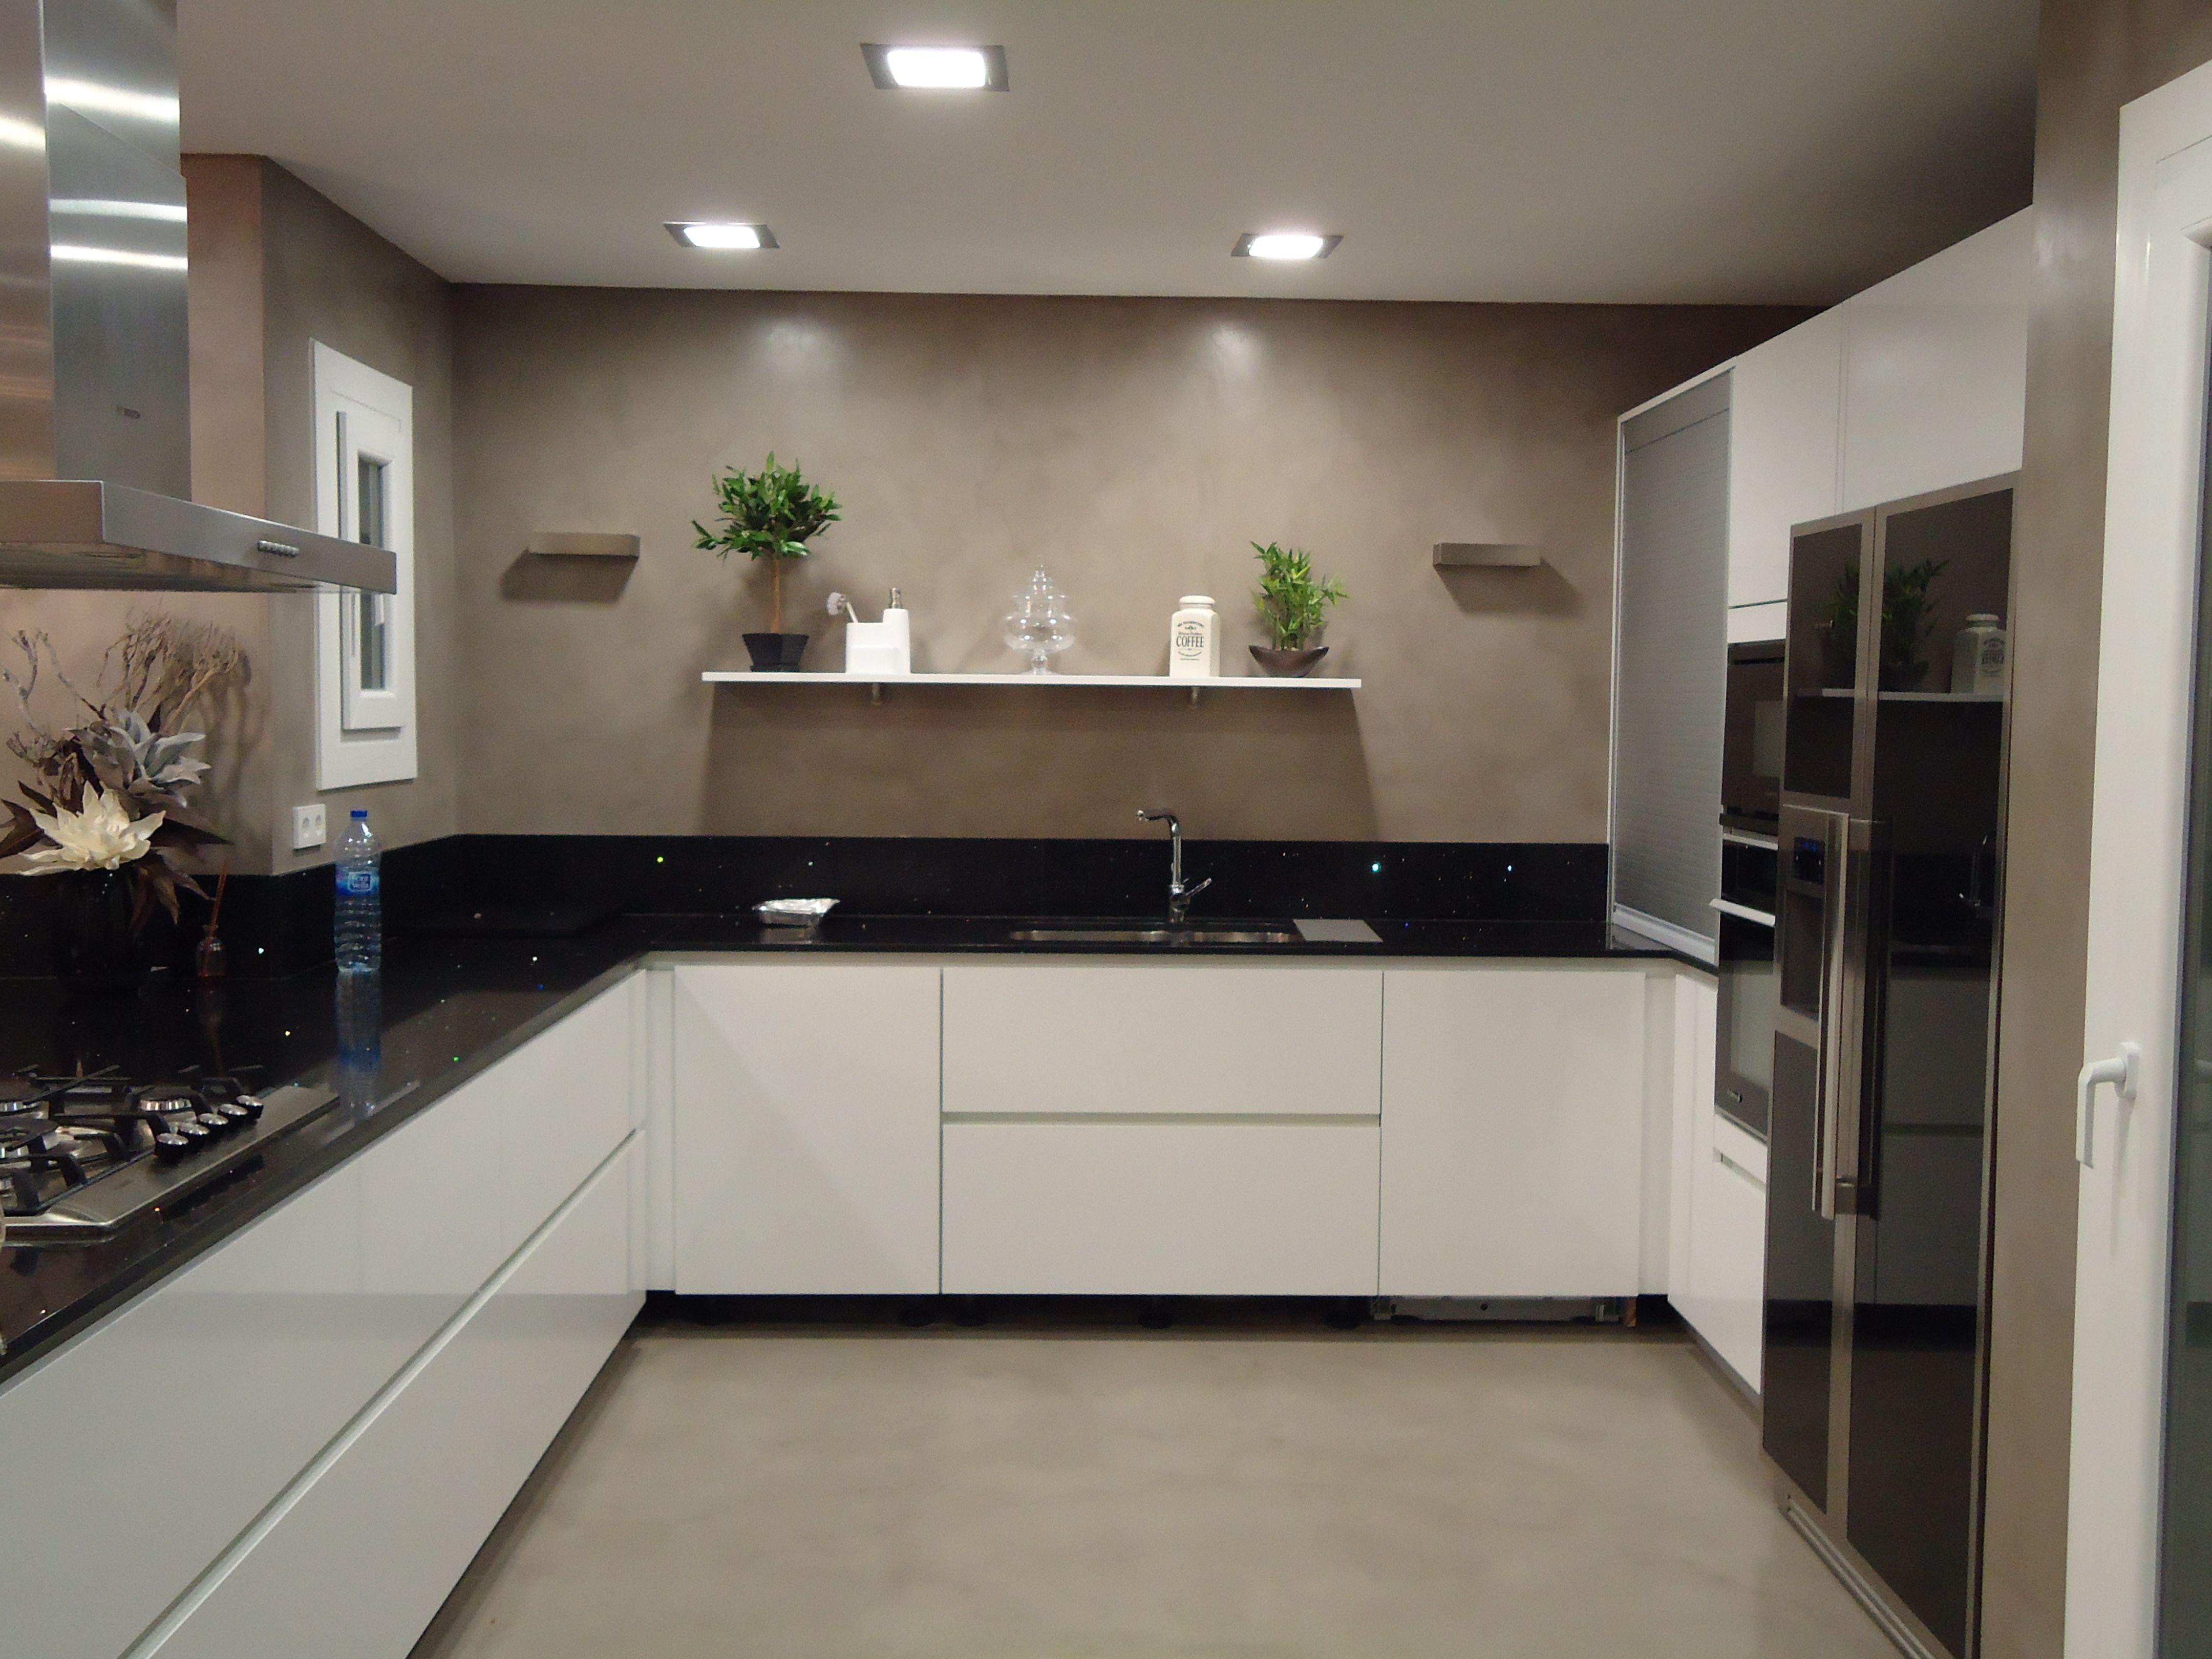 Revestimiento continuo decorativo para cocina con - Microcemento para cocinas ...